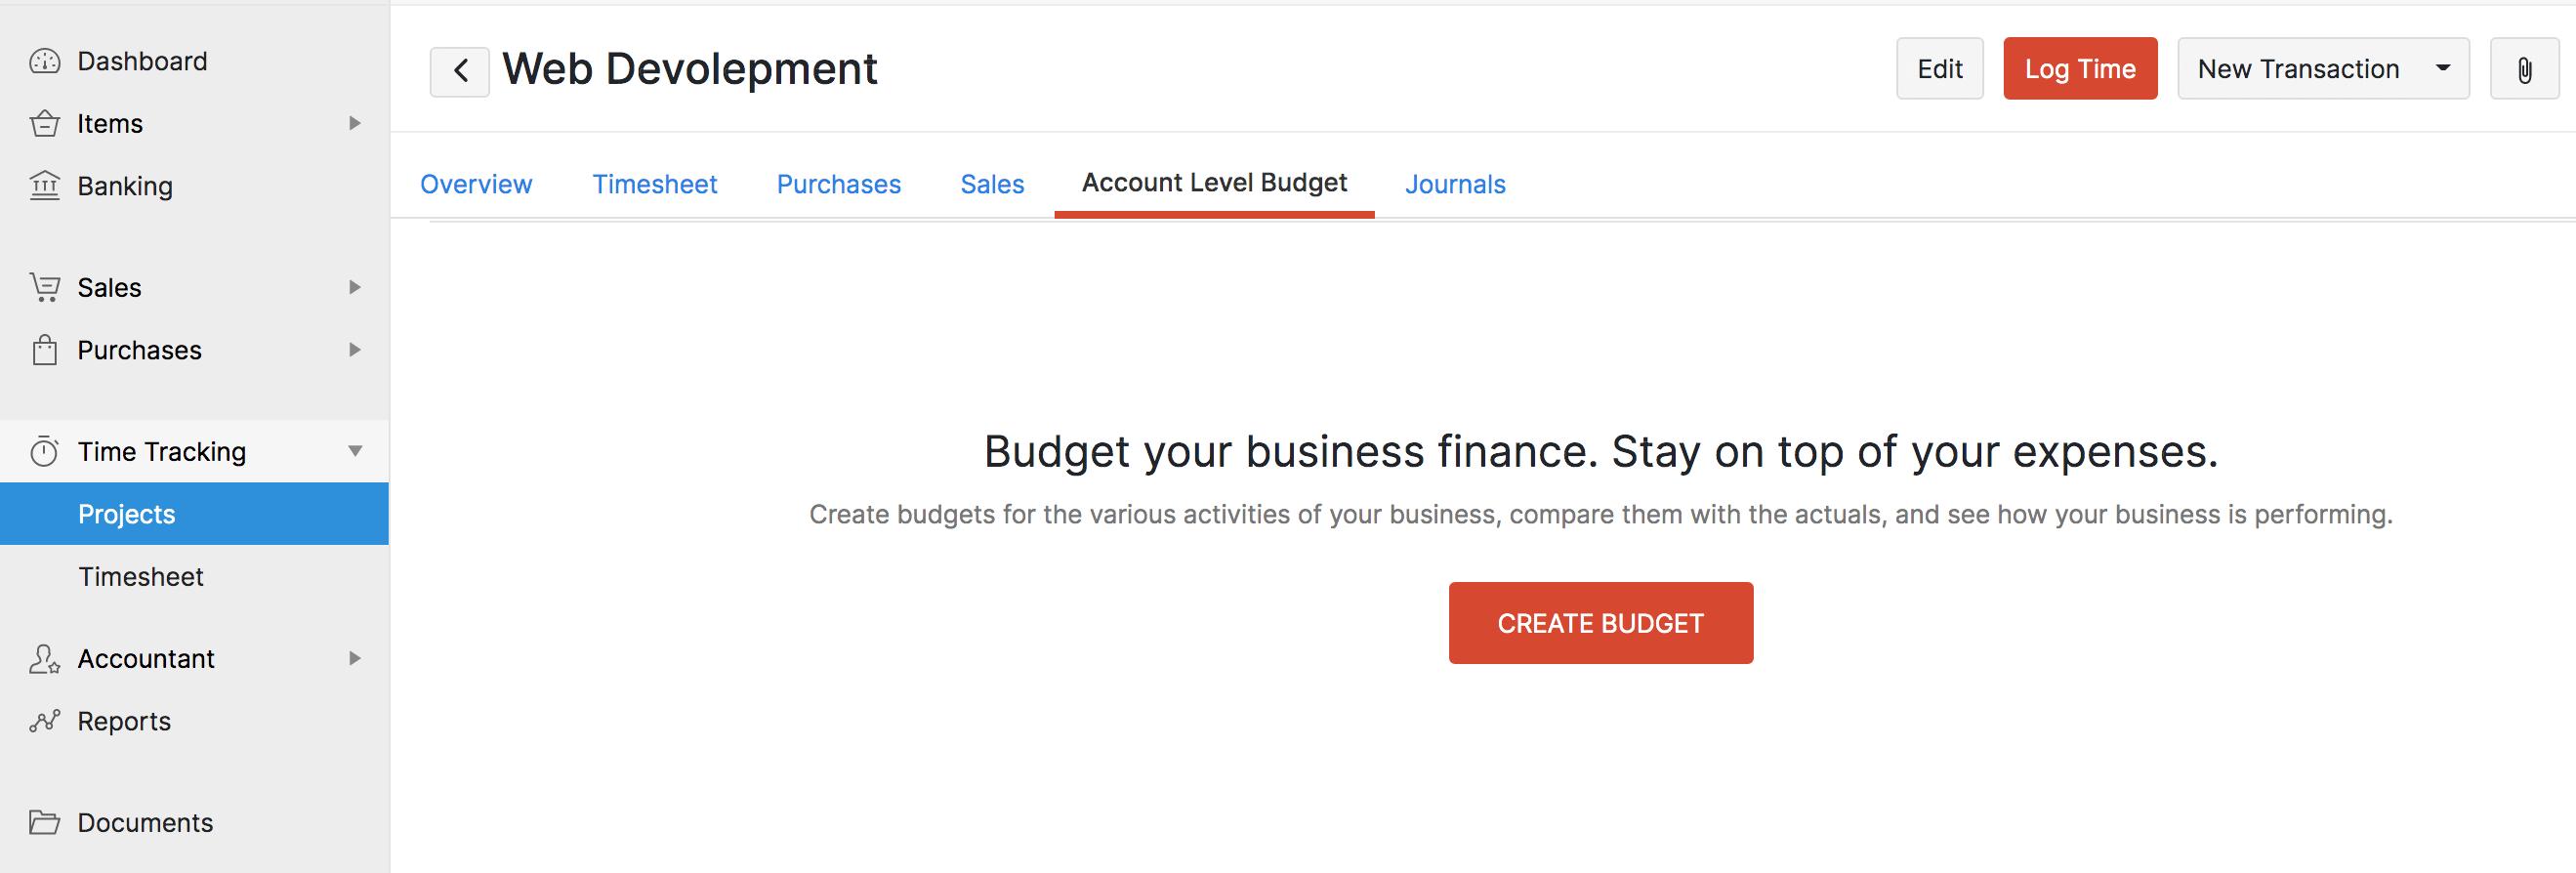 Create New Budget